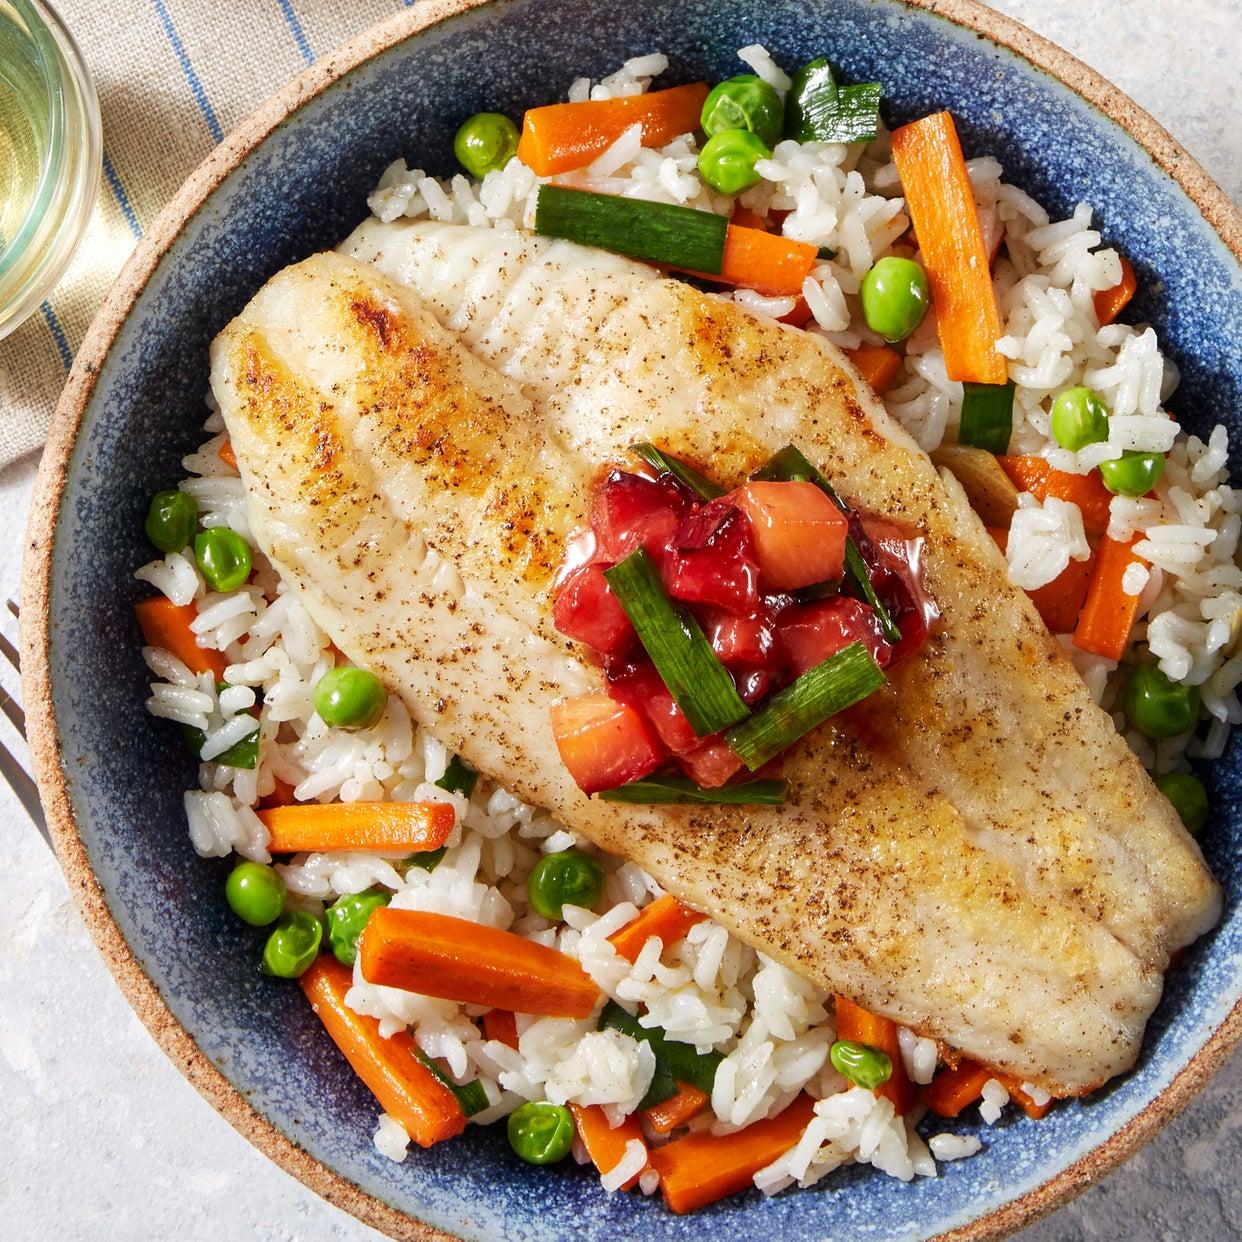 Crispy Catfish & Plum Sauce with Jasmine Rice, Sweet Peas, & Carrots